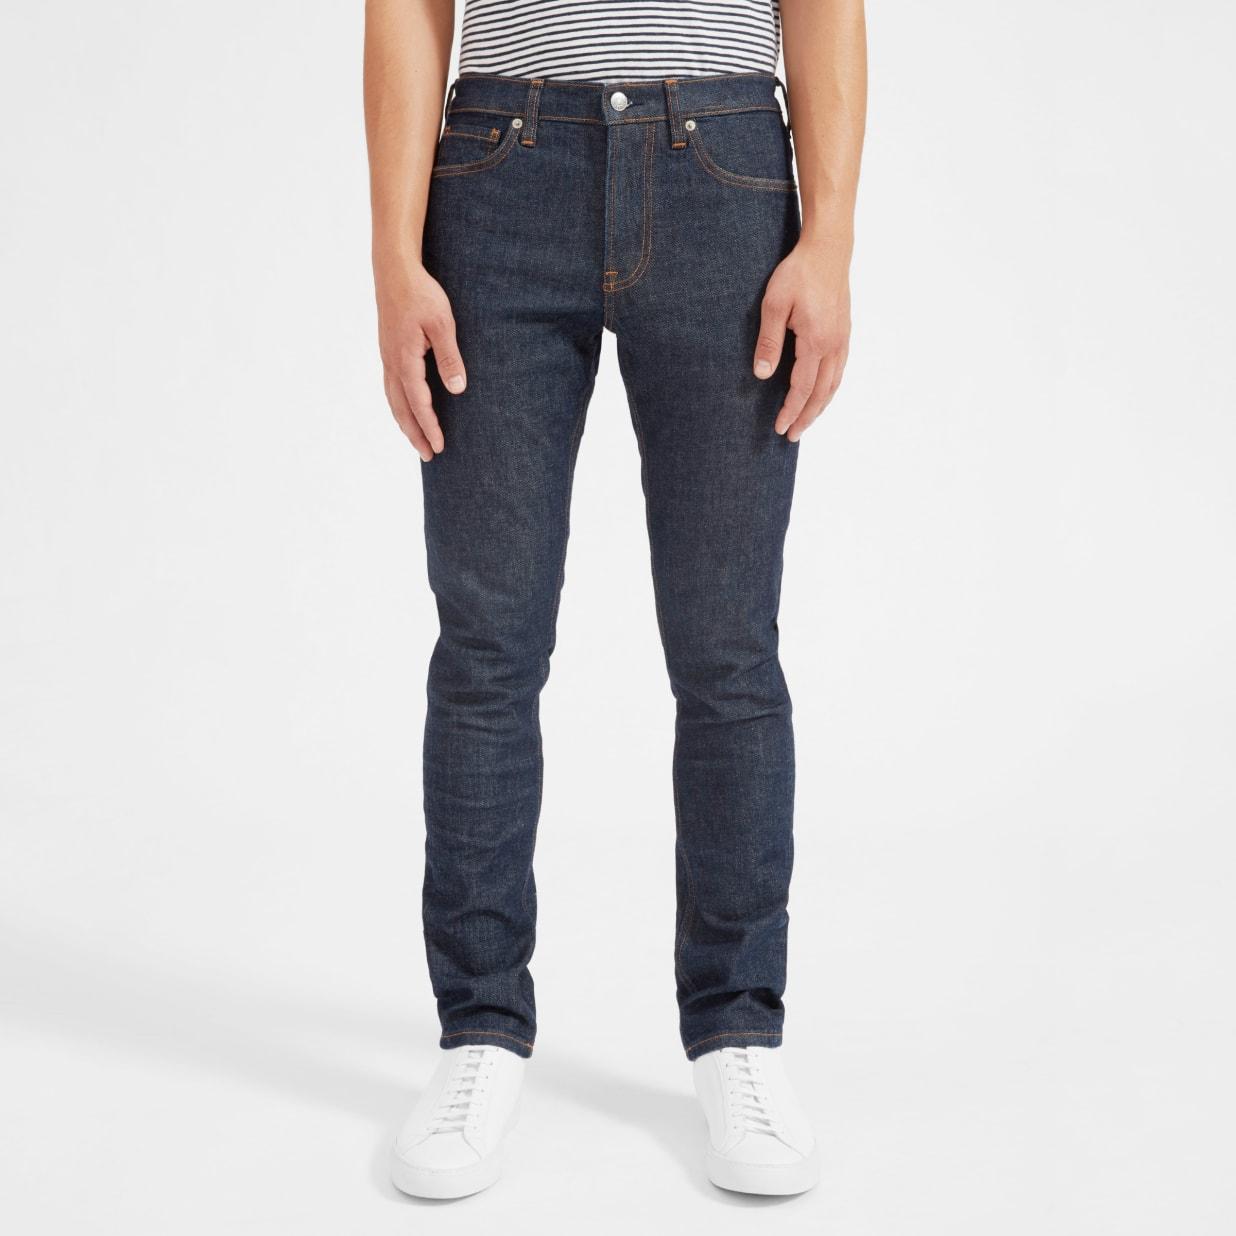 large discount timeless design wholesale dealer The Slim Fit Jean